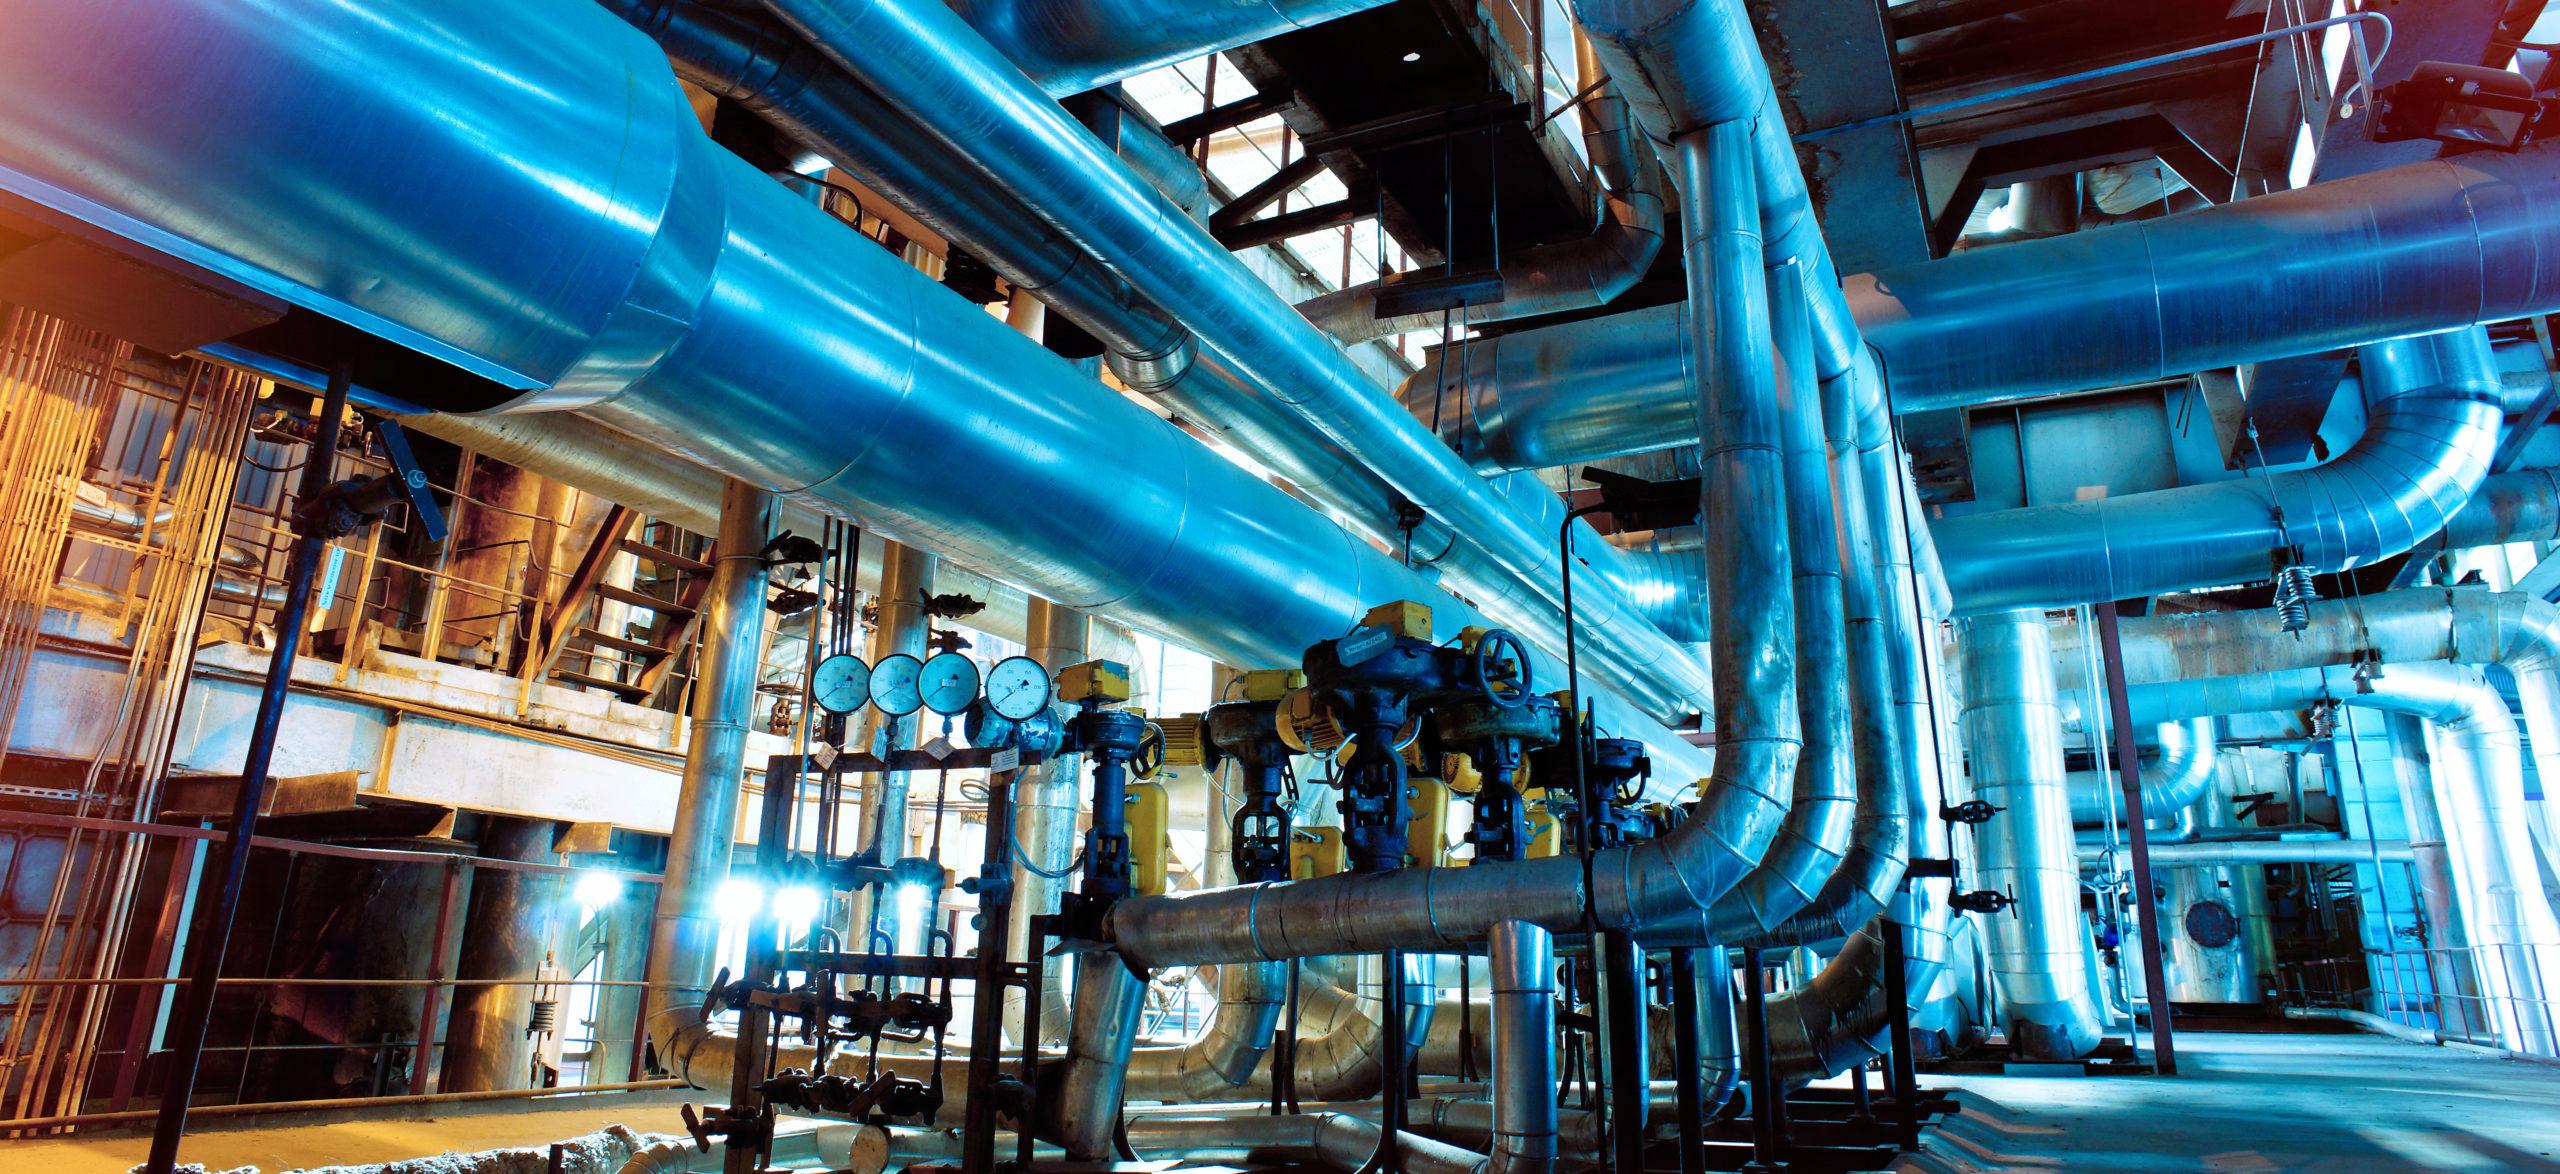 Industrial,Zone,,Steel,Pipelines,,Valves,And,Ladders